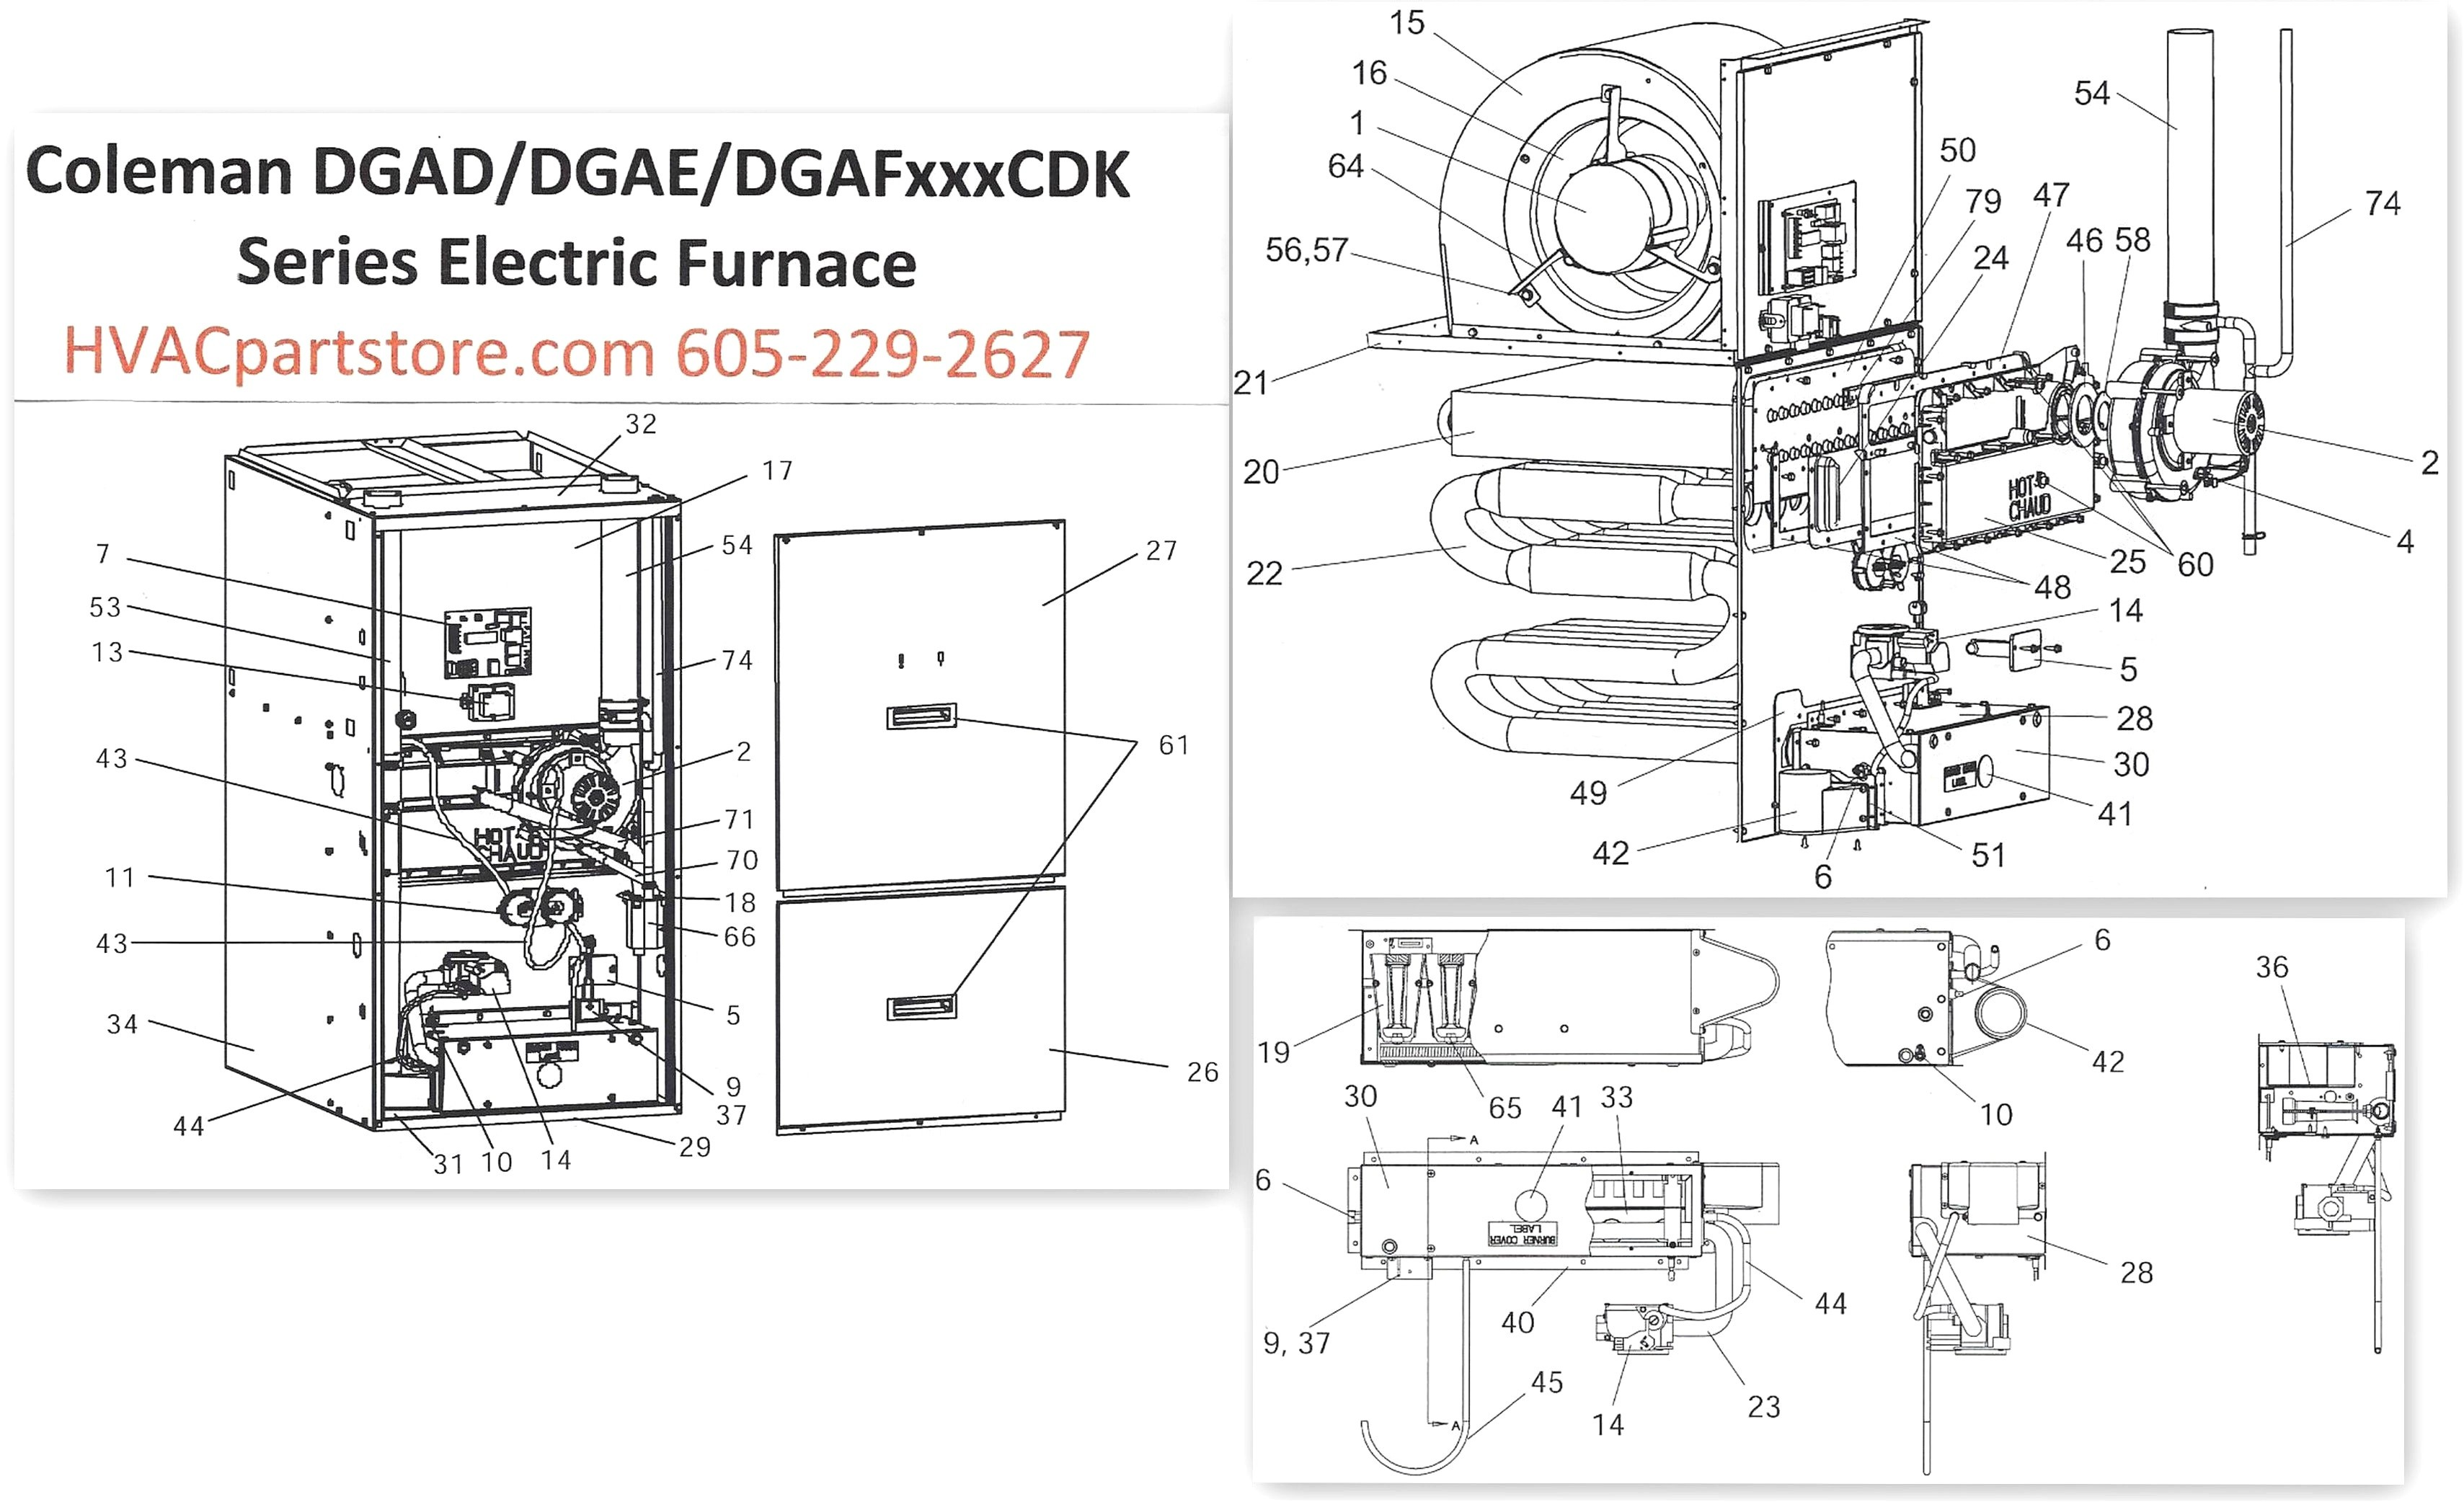 35 Suburban Rv Water Heater Parts Diagram Manual Guide